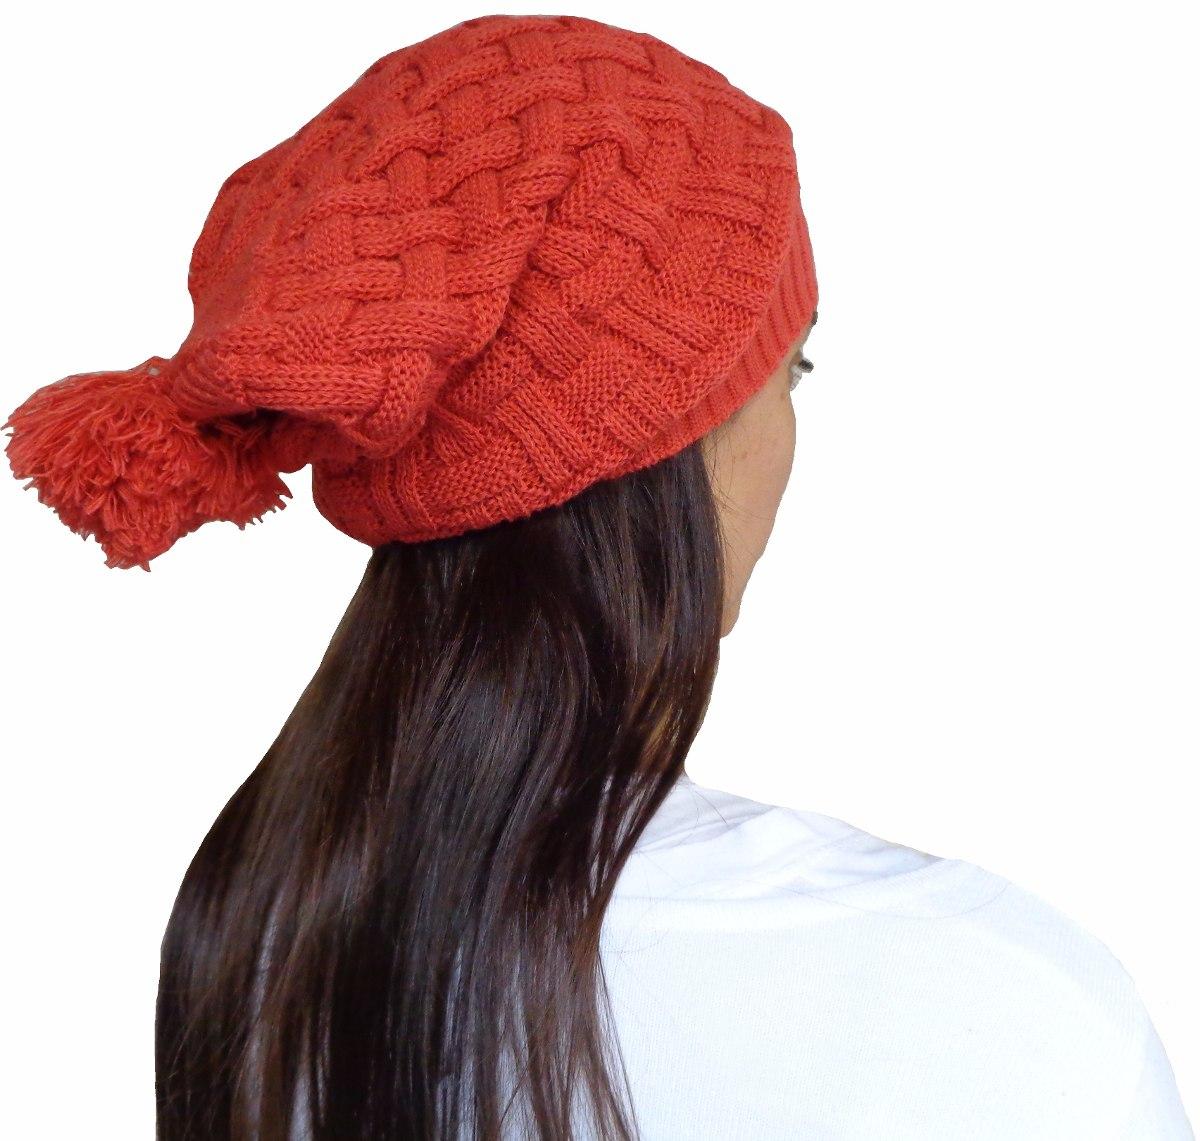 Gorro beanie dama hombre lana tejido invierno moda jpg 1200x1141 Beanie  imagenes gorros de invierno a7f530ece8d